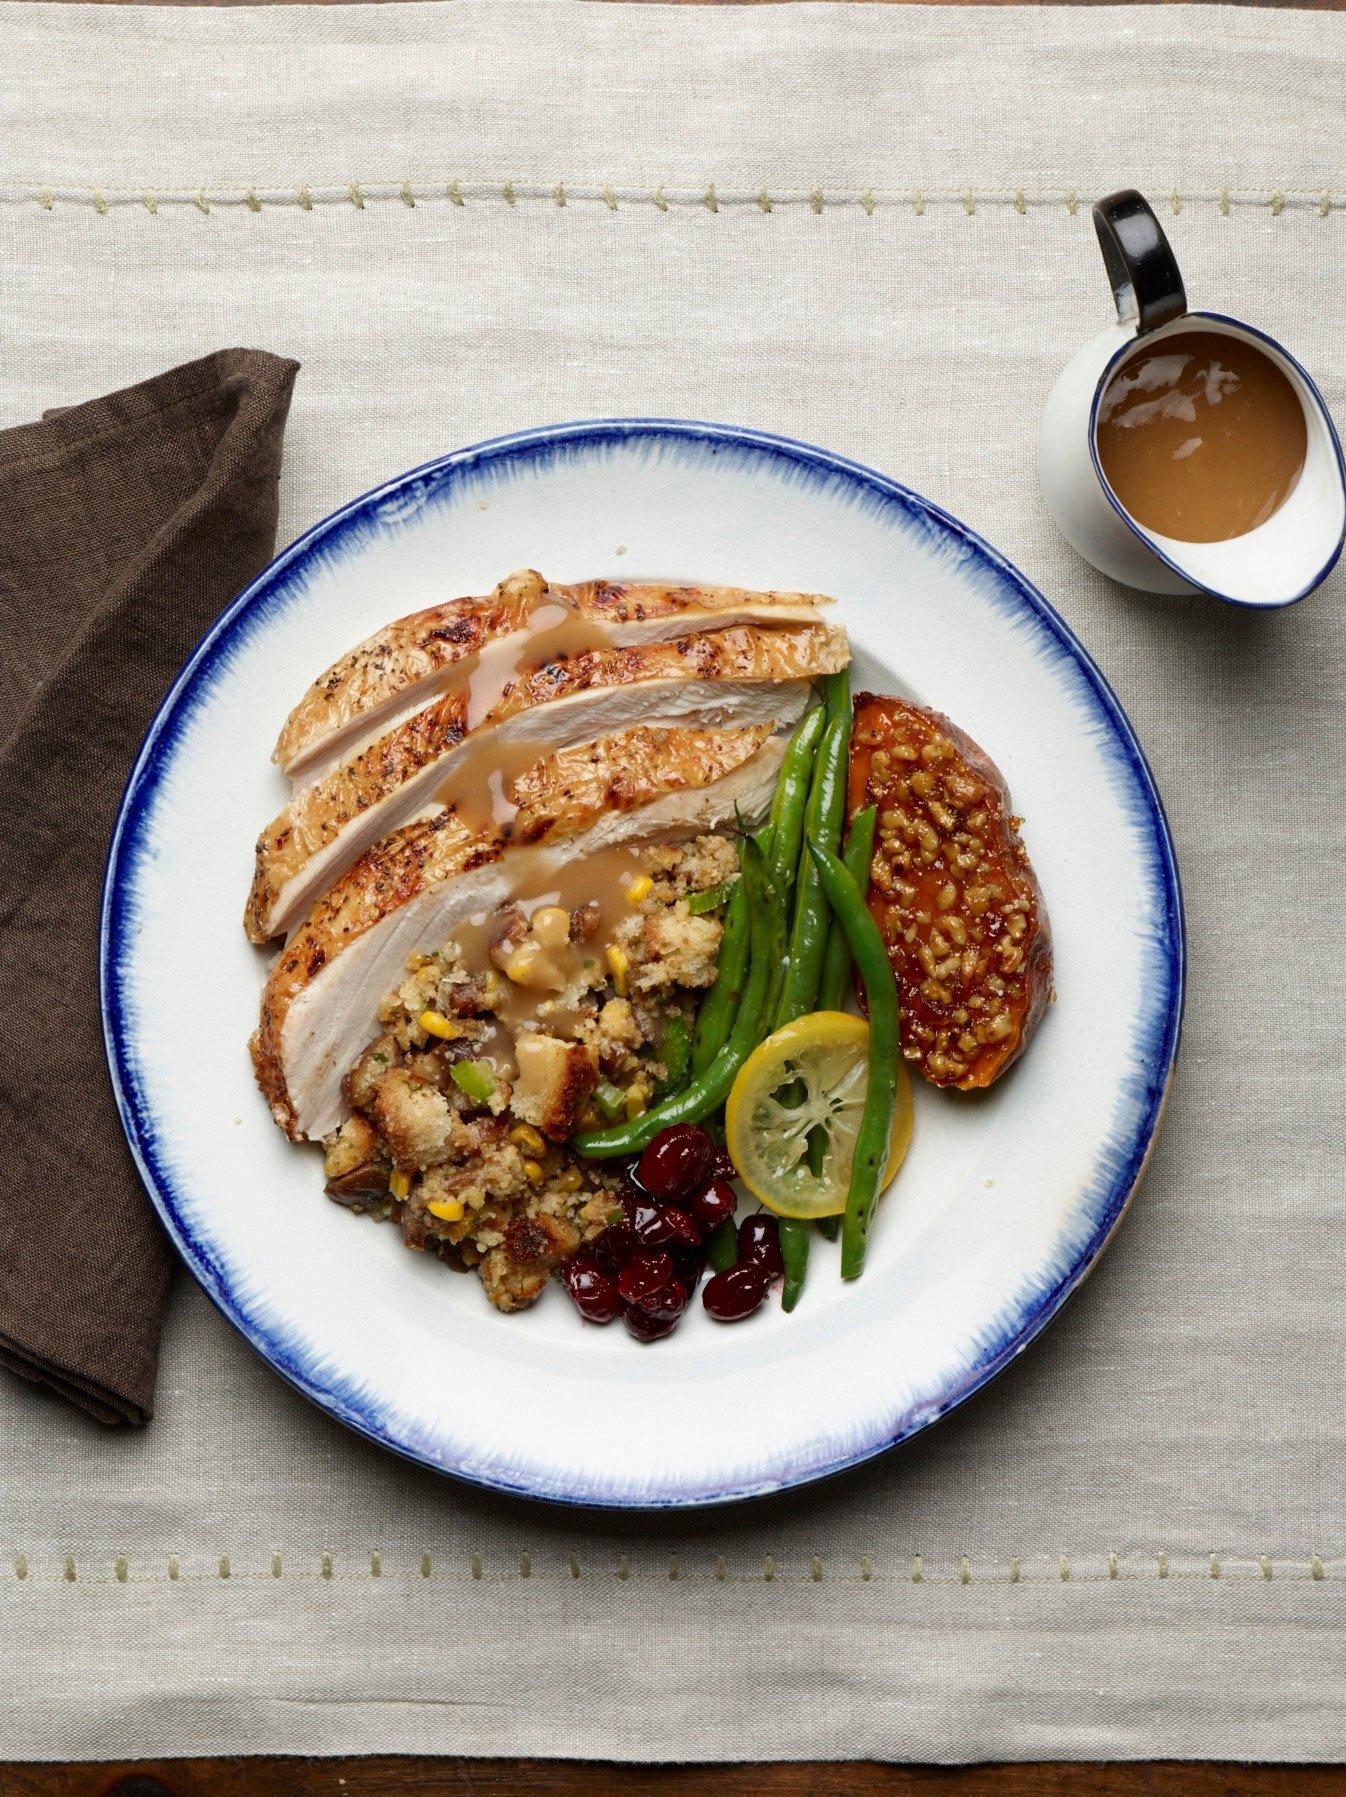 Photograph courtesy of Farmers Restaurant Group.